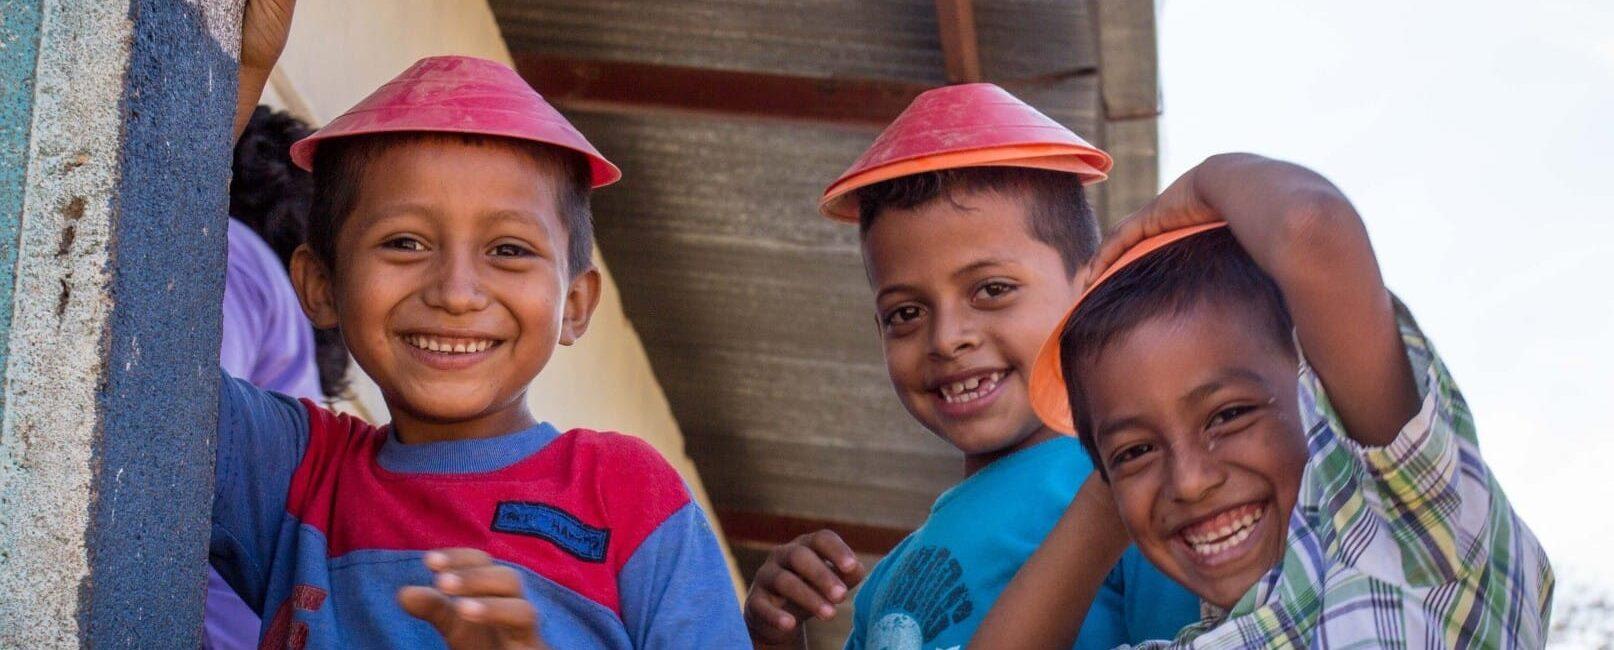 Mexico Oaxaca Hotel con corazon -profit-goes-to-education-